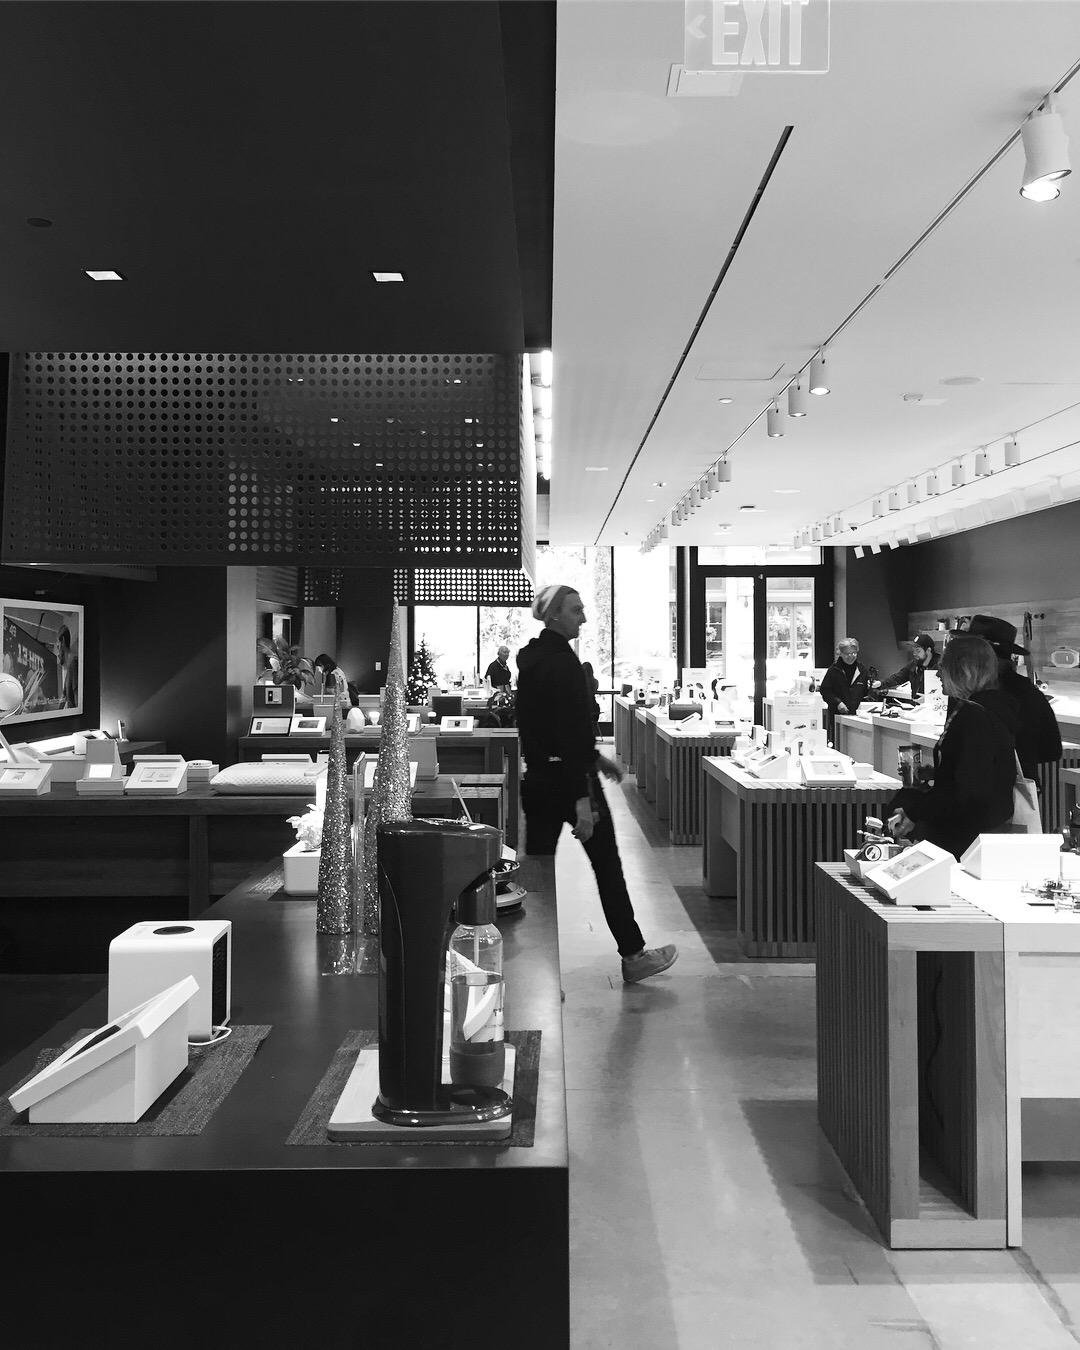 b8ta | Seattle | 2016  Responsibilities: Lead Designer for Overall Concept, Layout, Fixture Design, Digital Integration, Fixture Documentation, Lighting Intent, Visualization Photo: Matt Schaefer